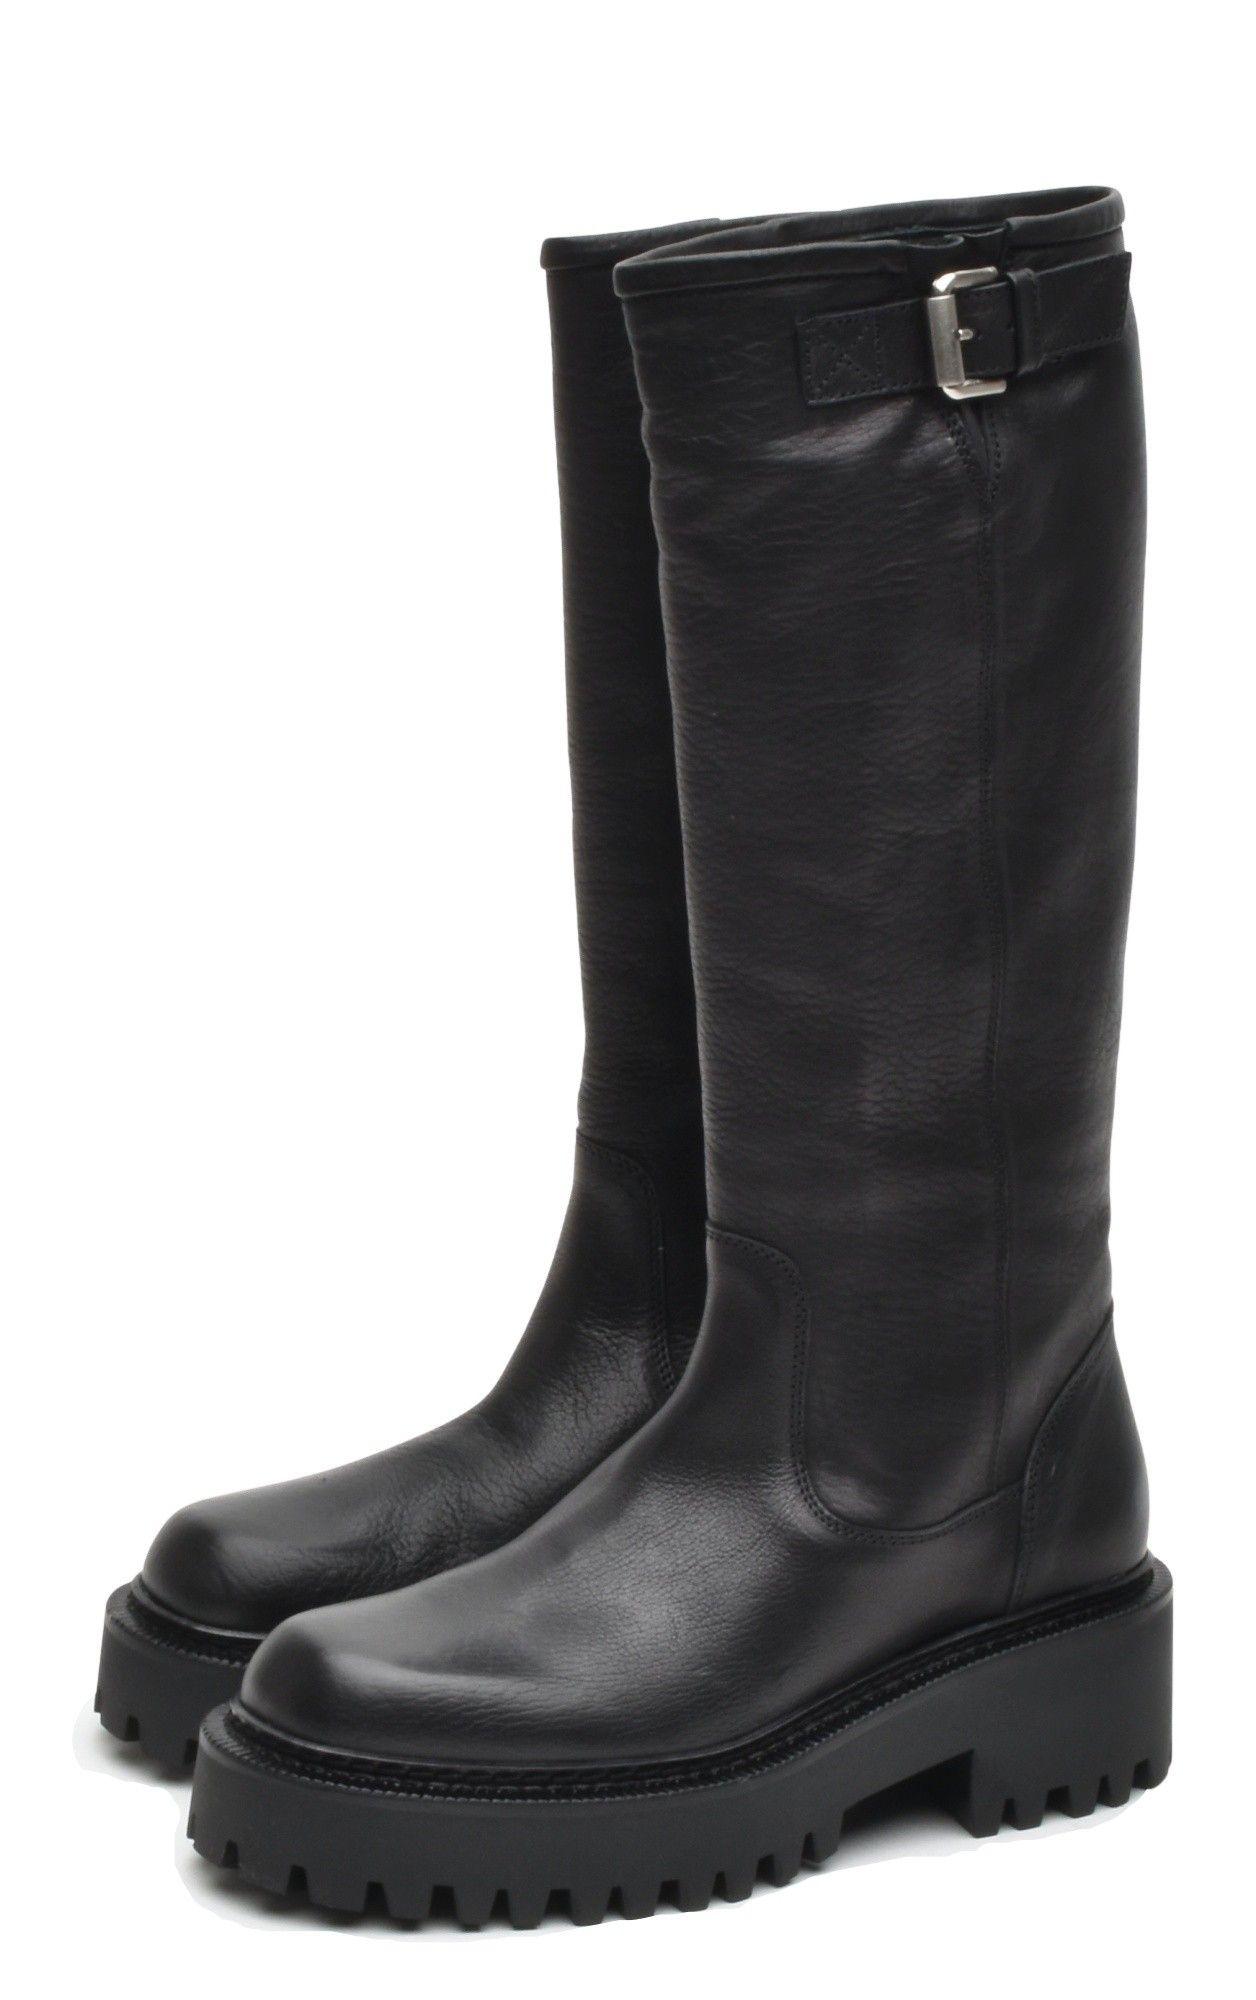 VIC MATIÈ - Damen Schuhe - Stivale Santos - Black